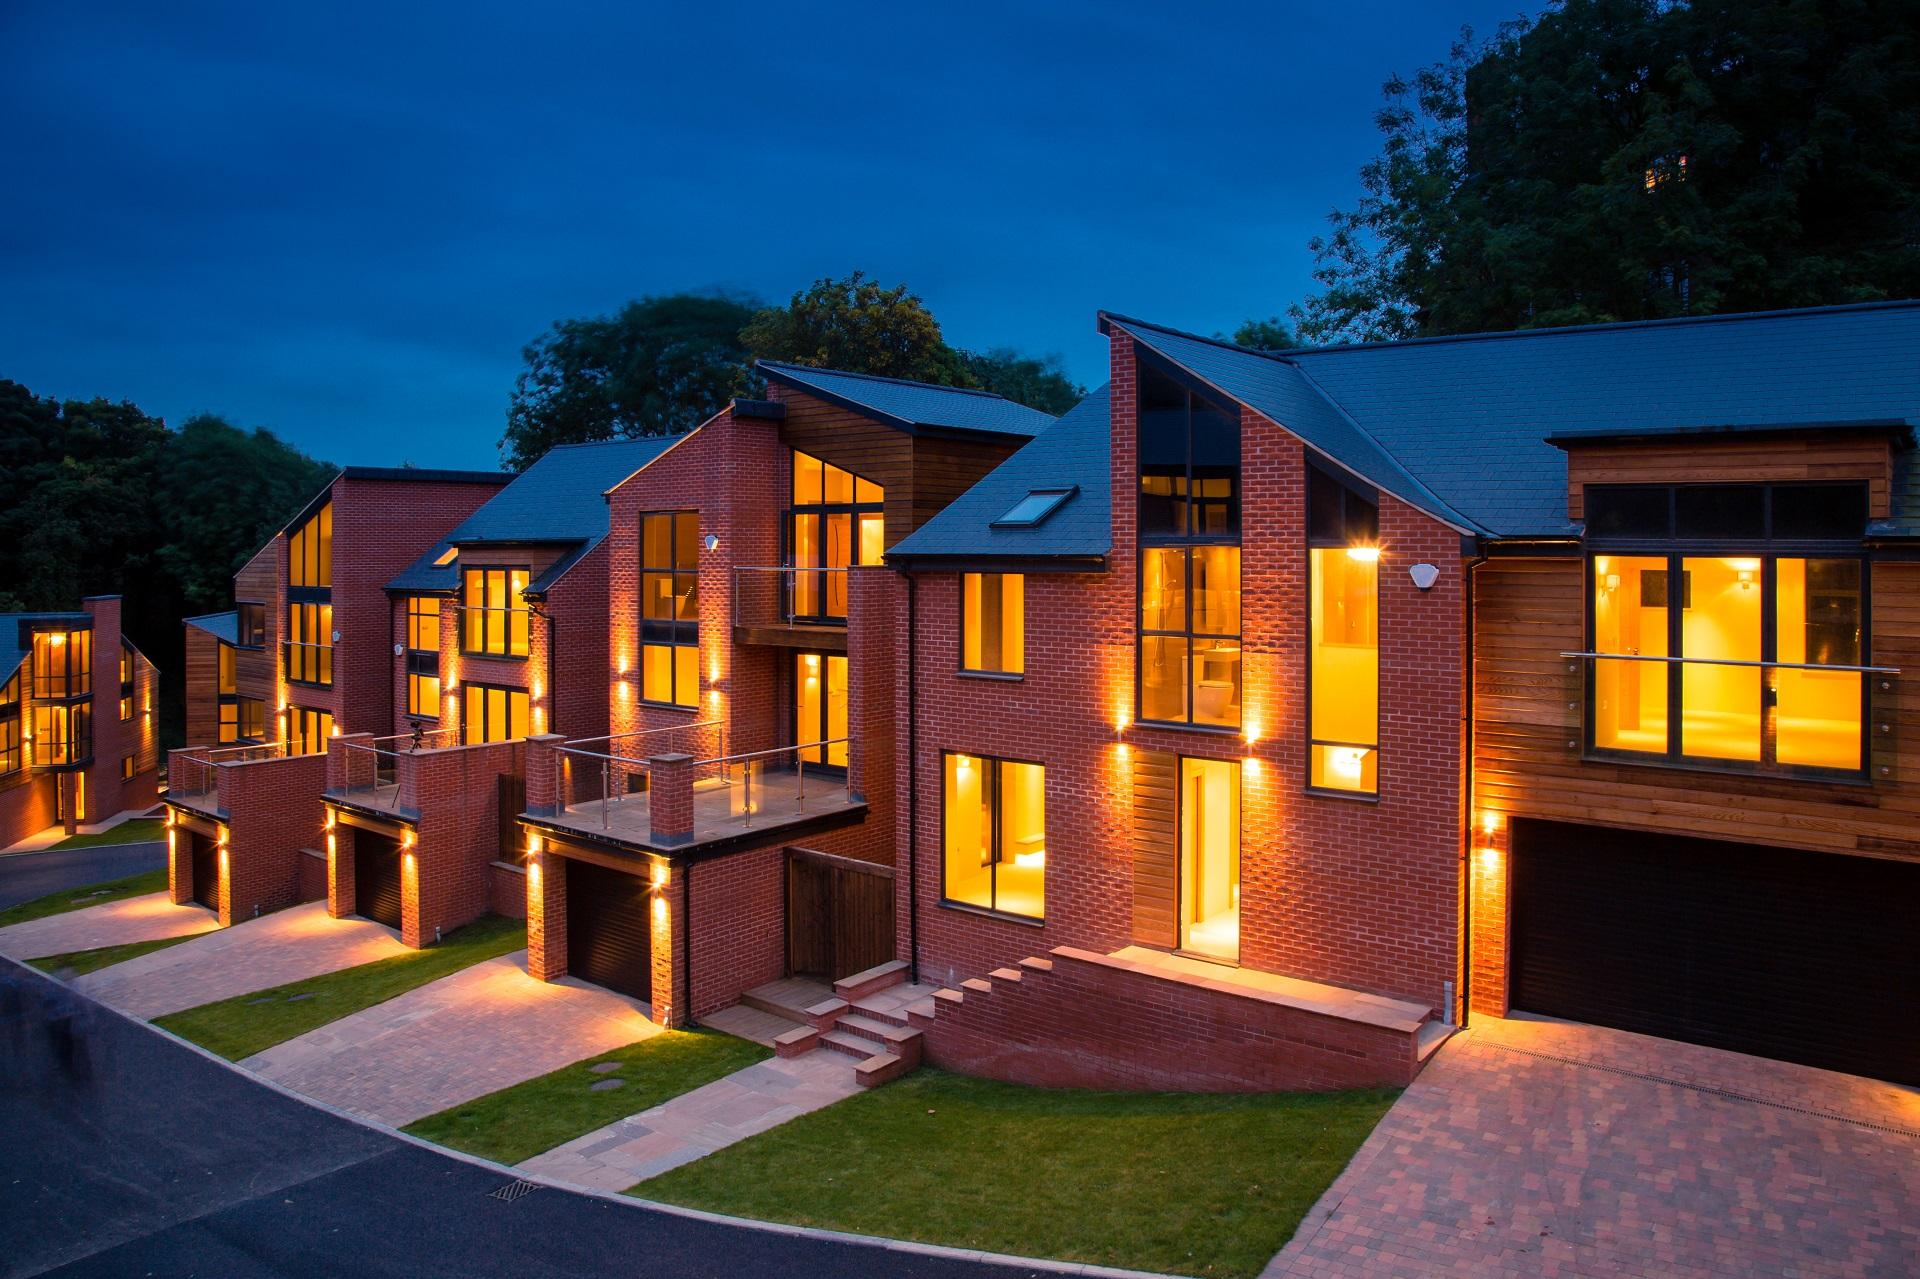 The Crescent, Alexander Park, Nottingham, Luxury housing development, executive homes, Nottingham